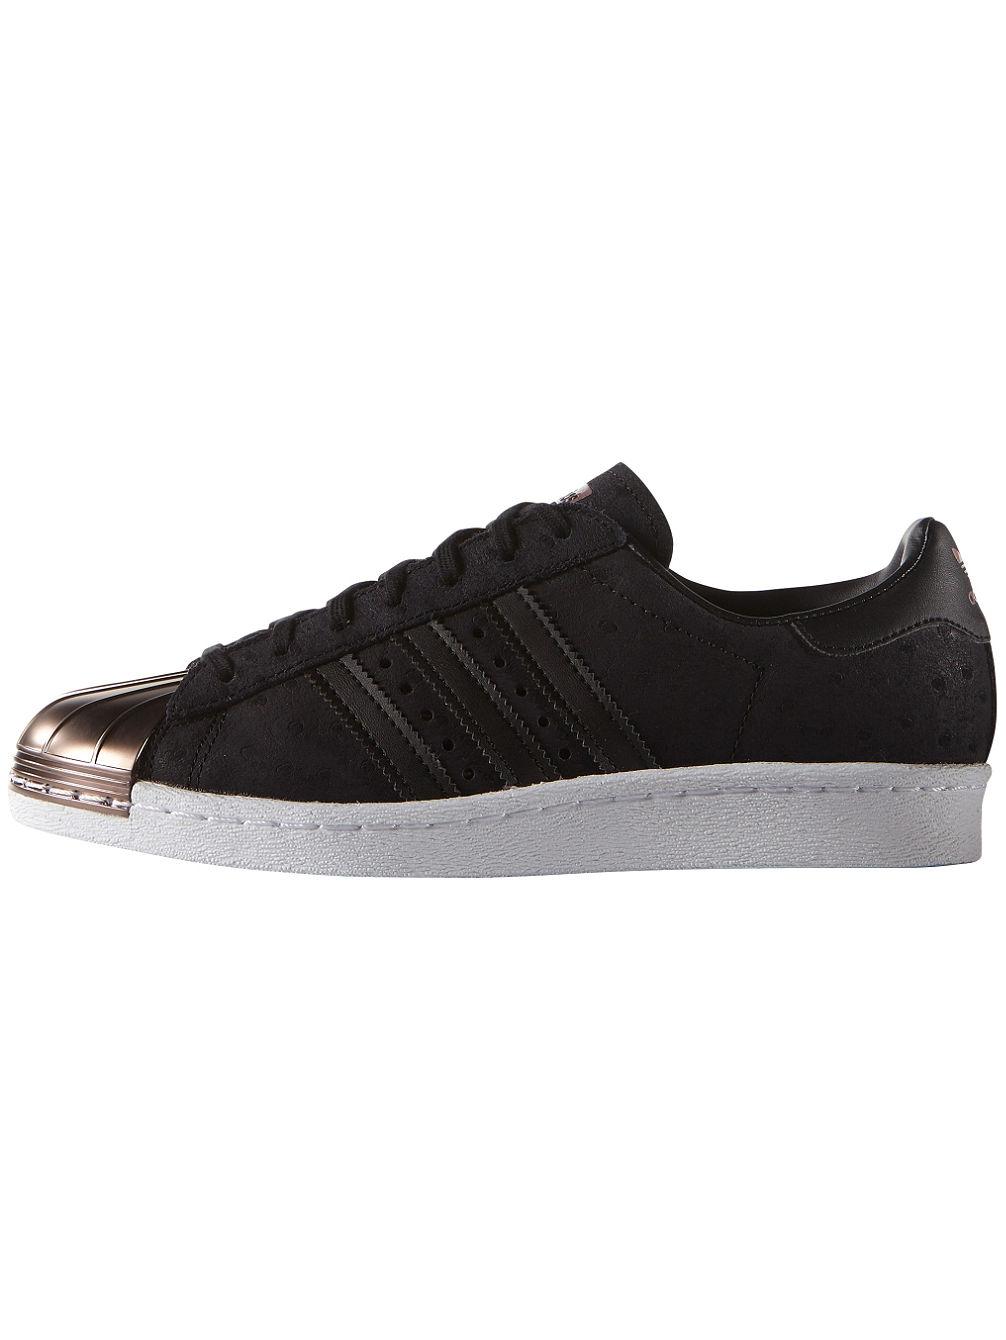 buy adidas originals superstar 80s metal toe sneakers. Black Bedroom Furniture Sets. Home Design Ideas